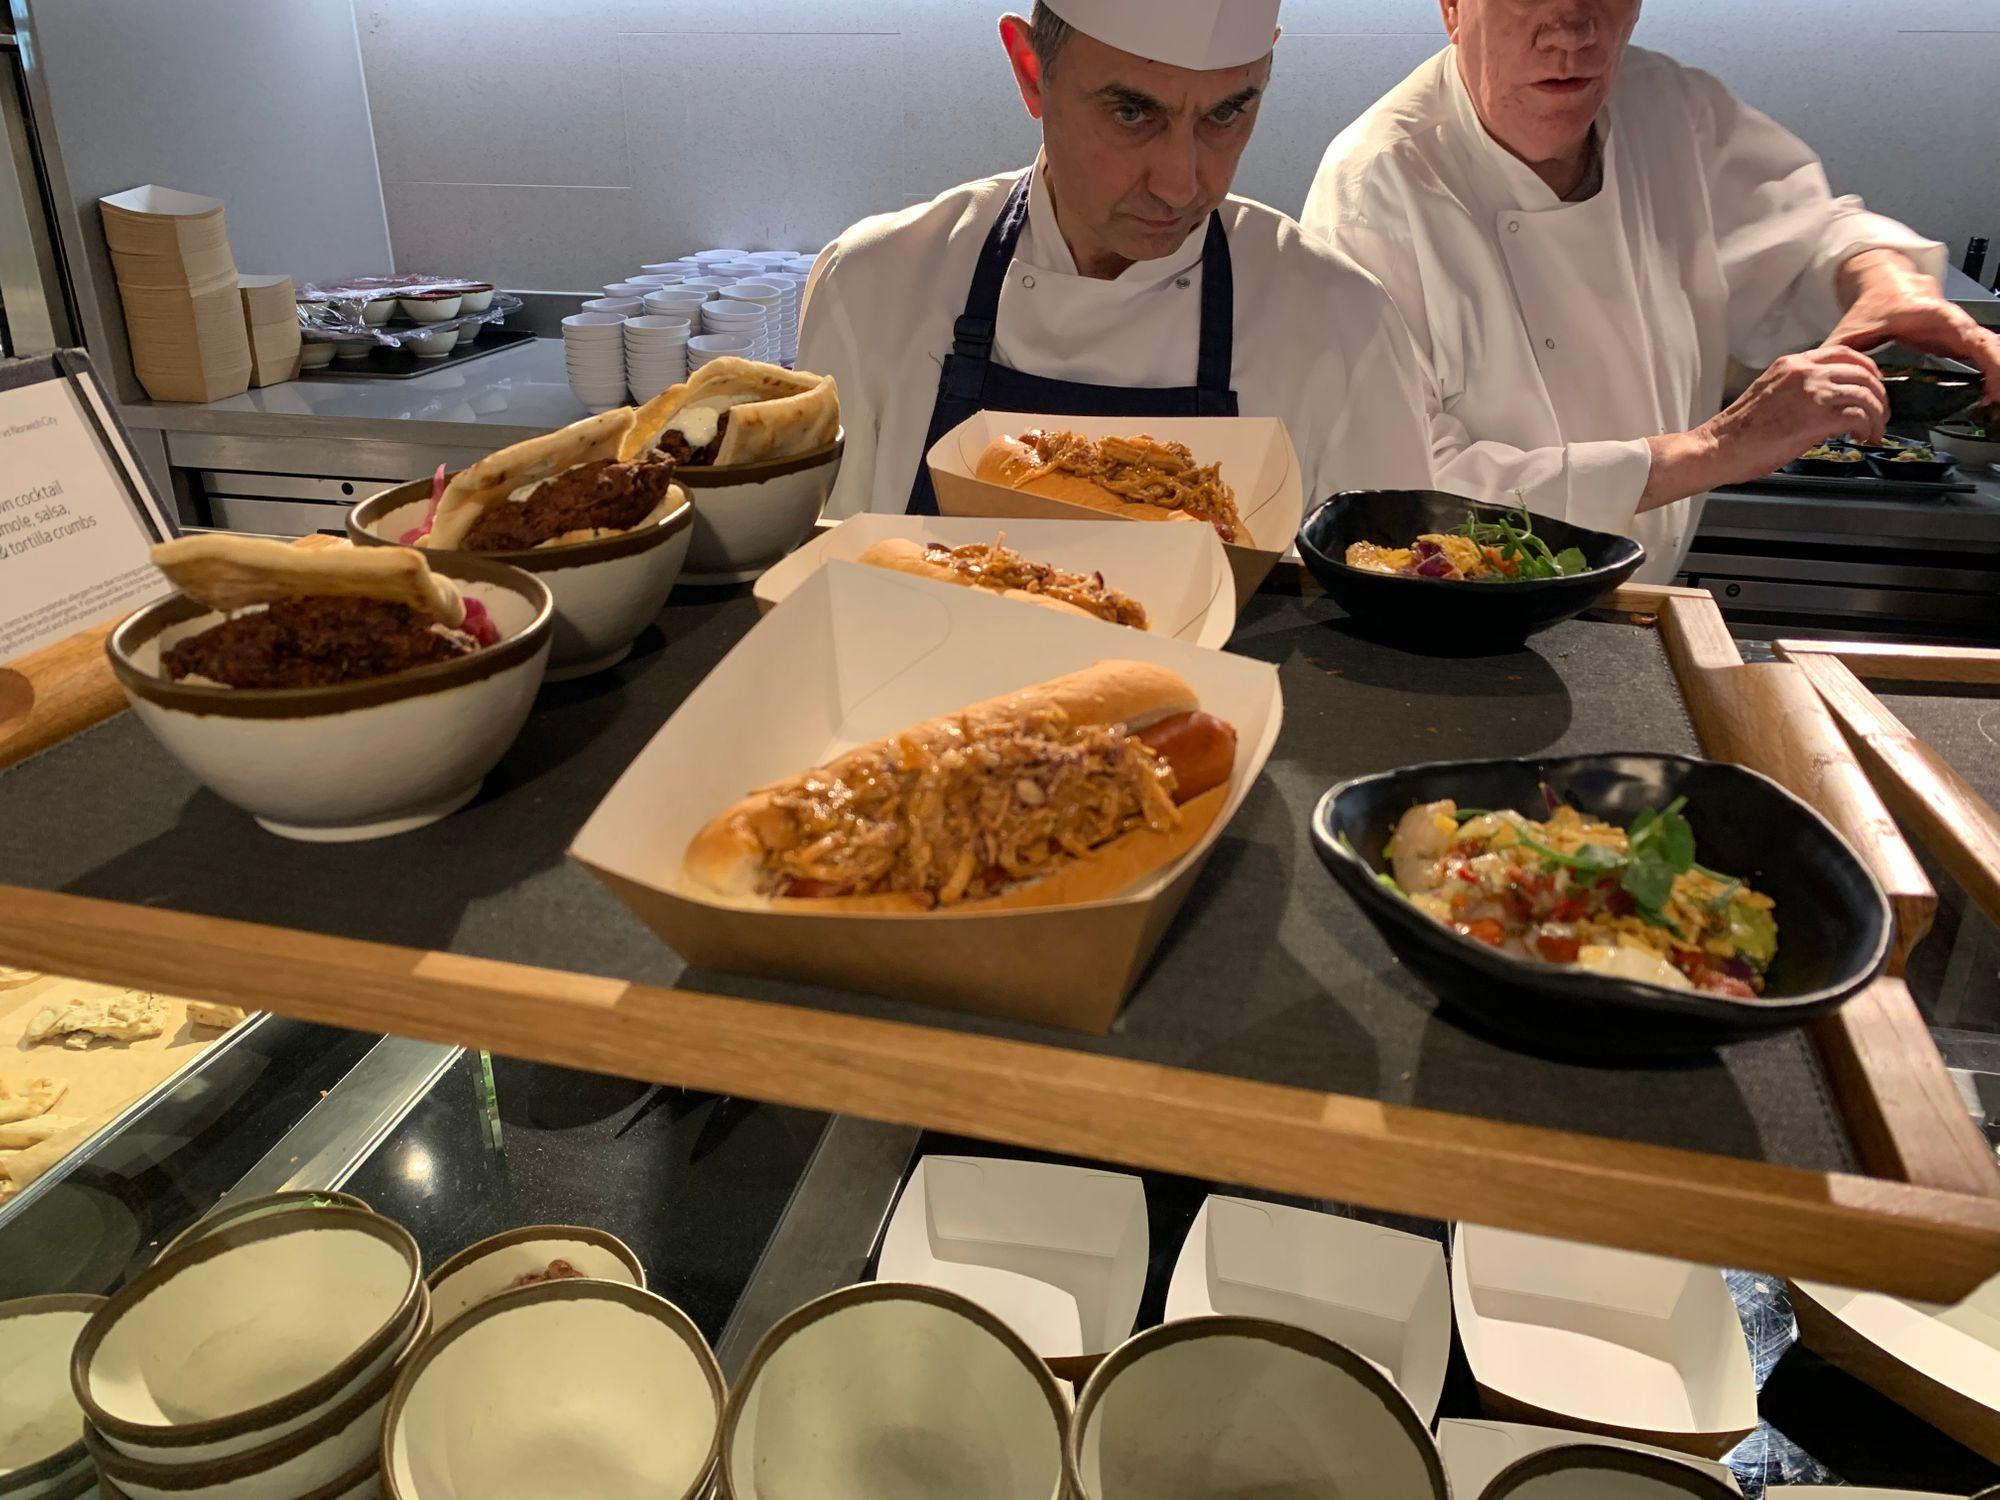 Chef's preparing meals